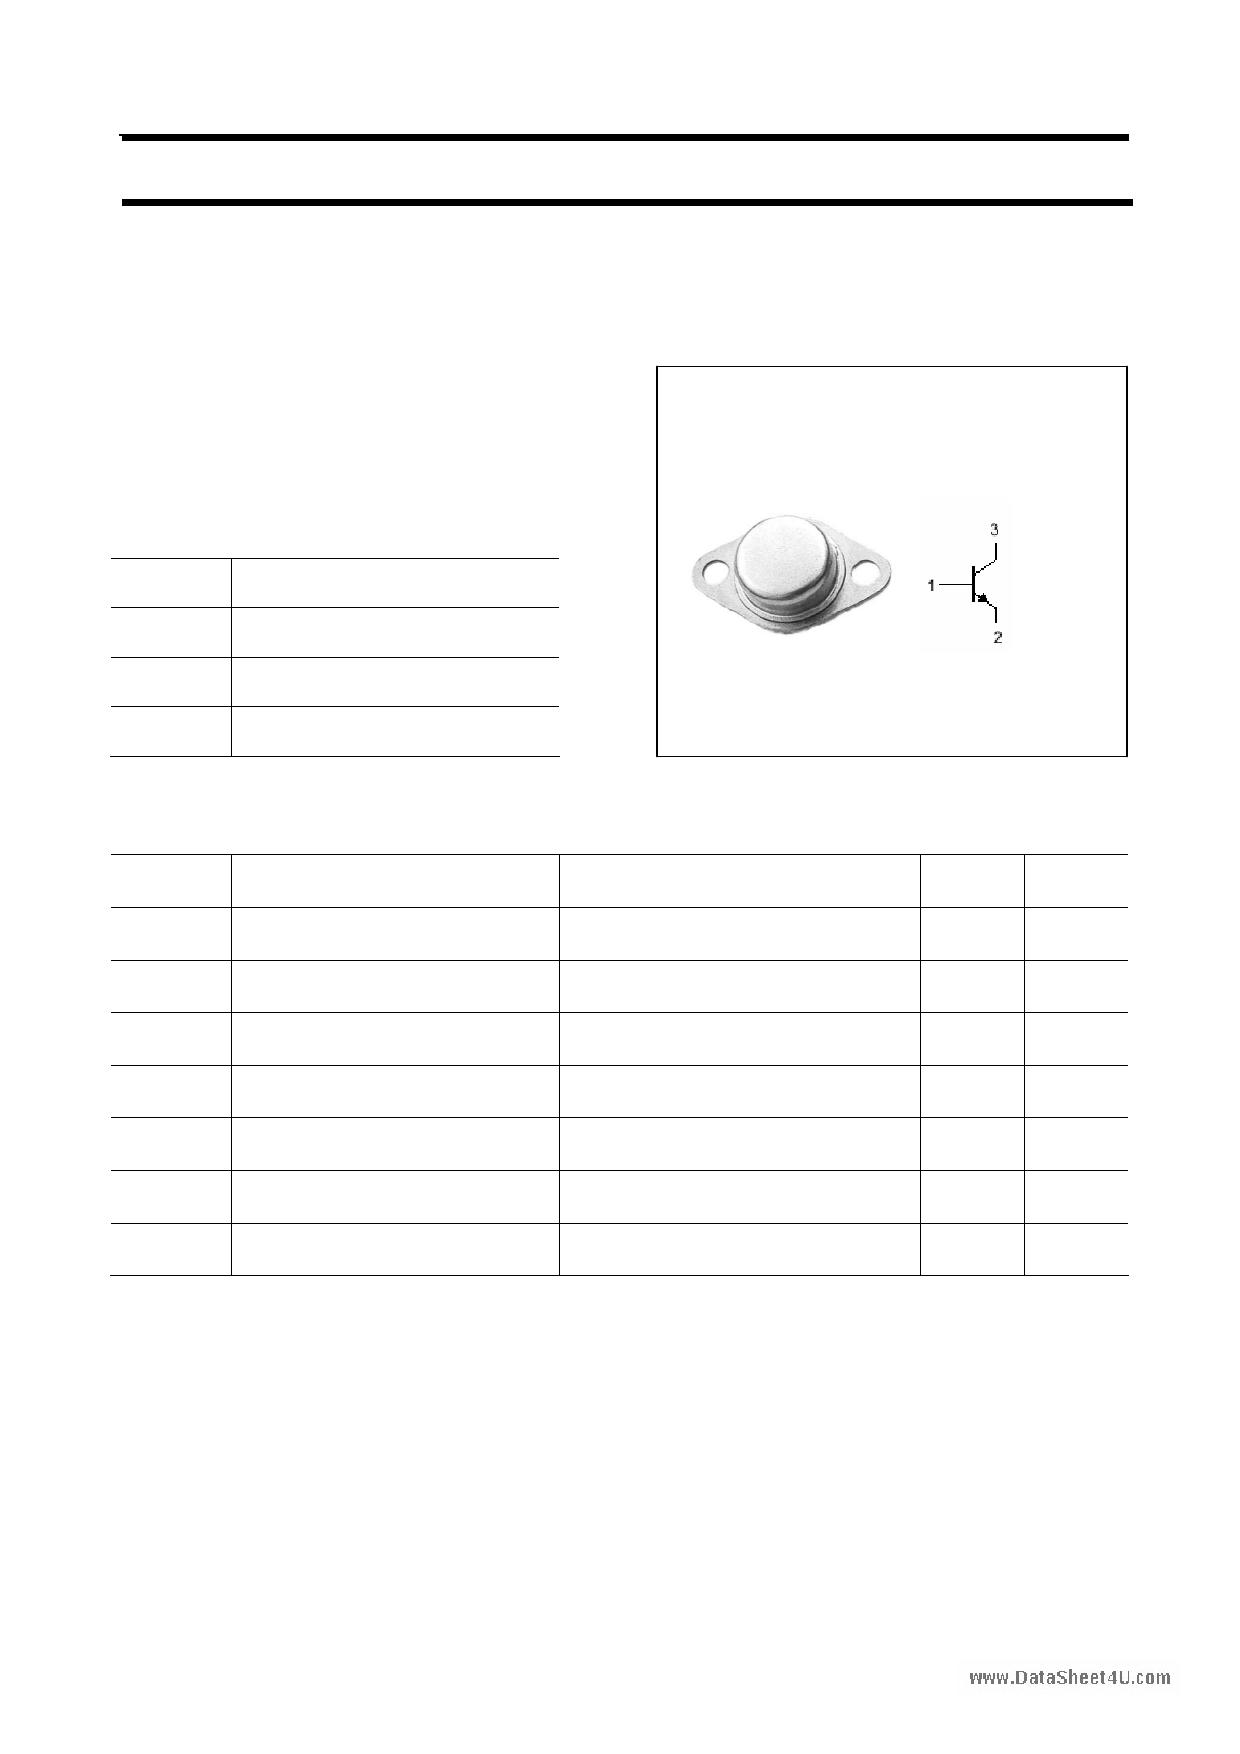 C1316 Datasheet, C1316 PDF,ピン配置, 機能